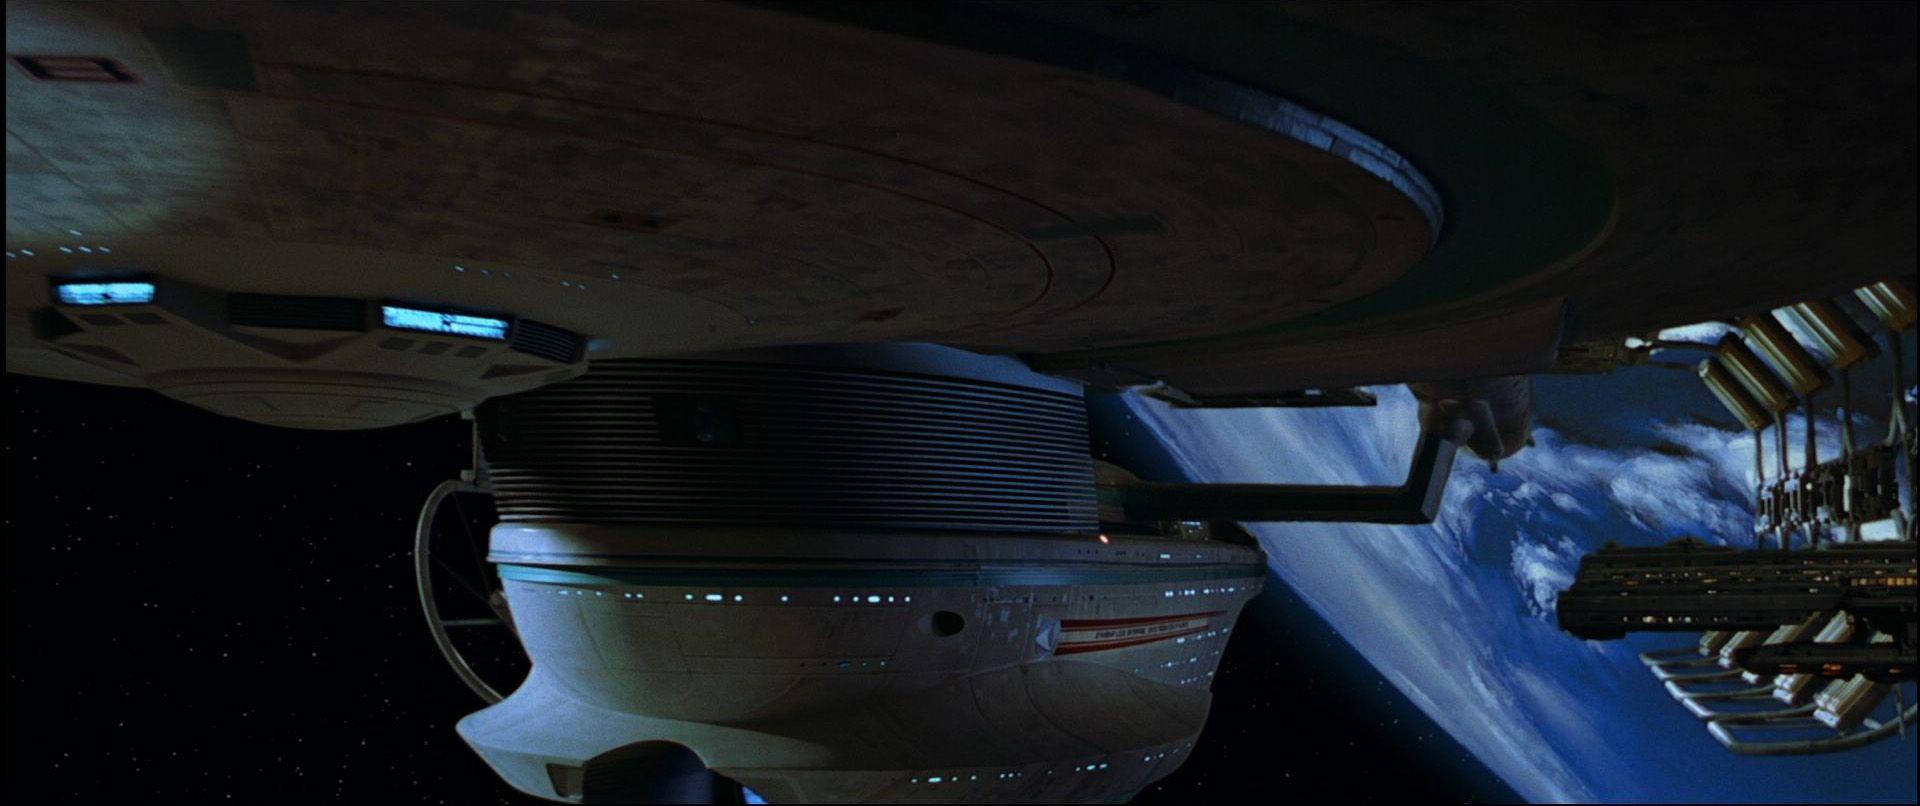 pin federation starfleet class - photo #31